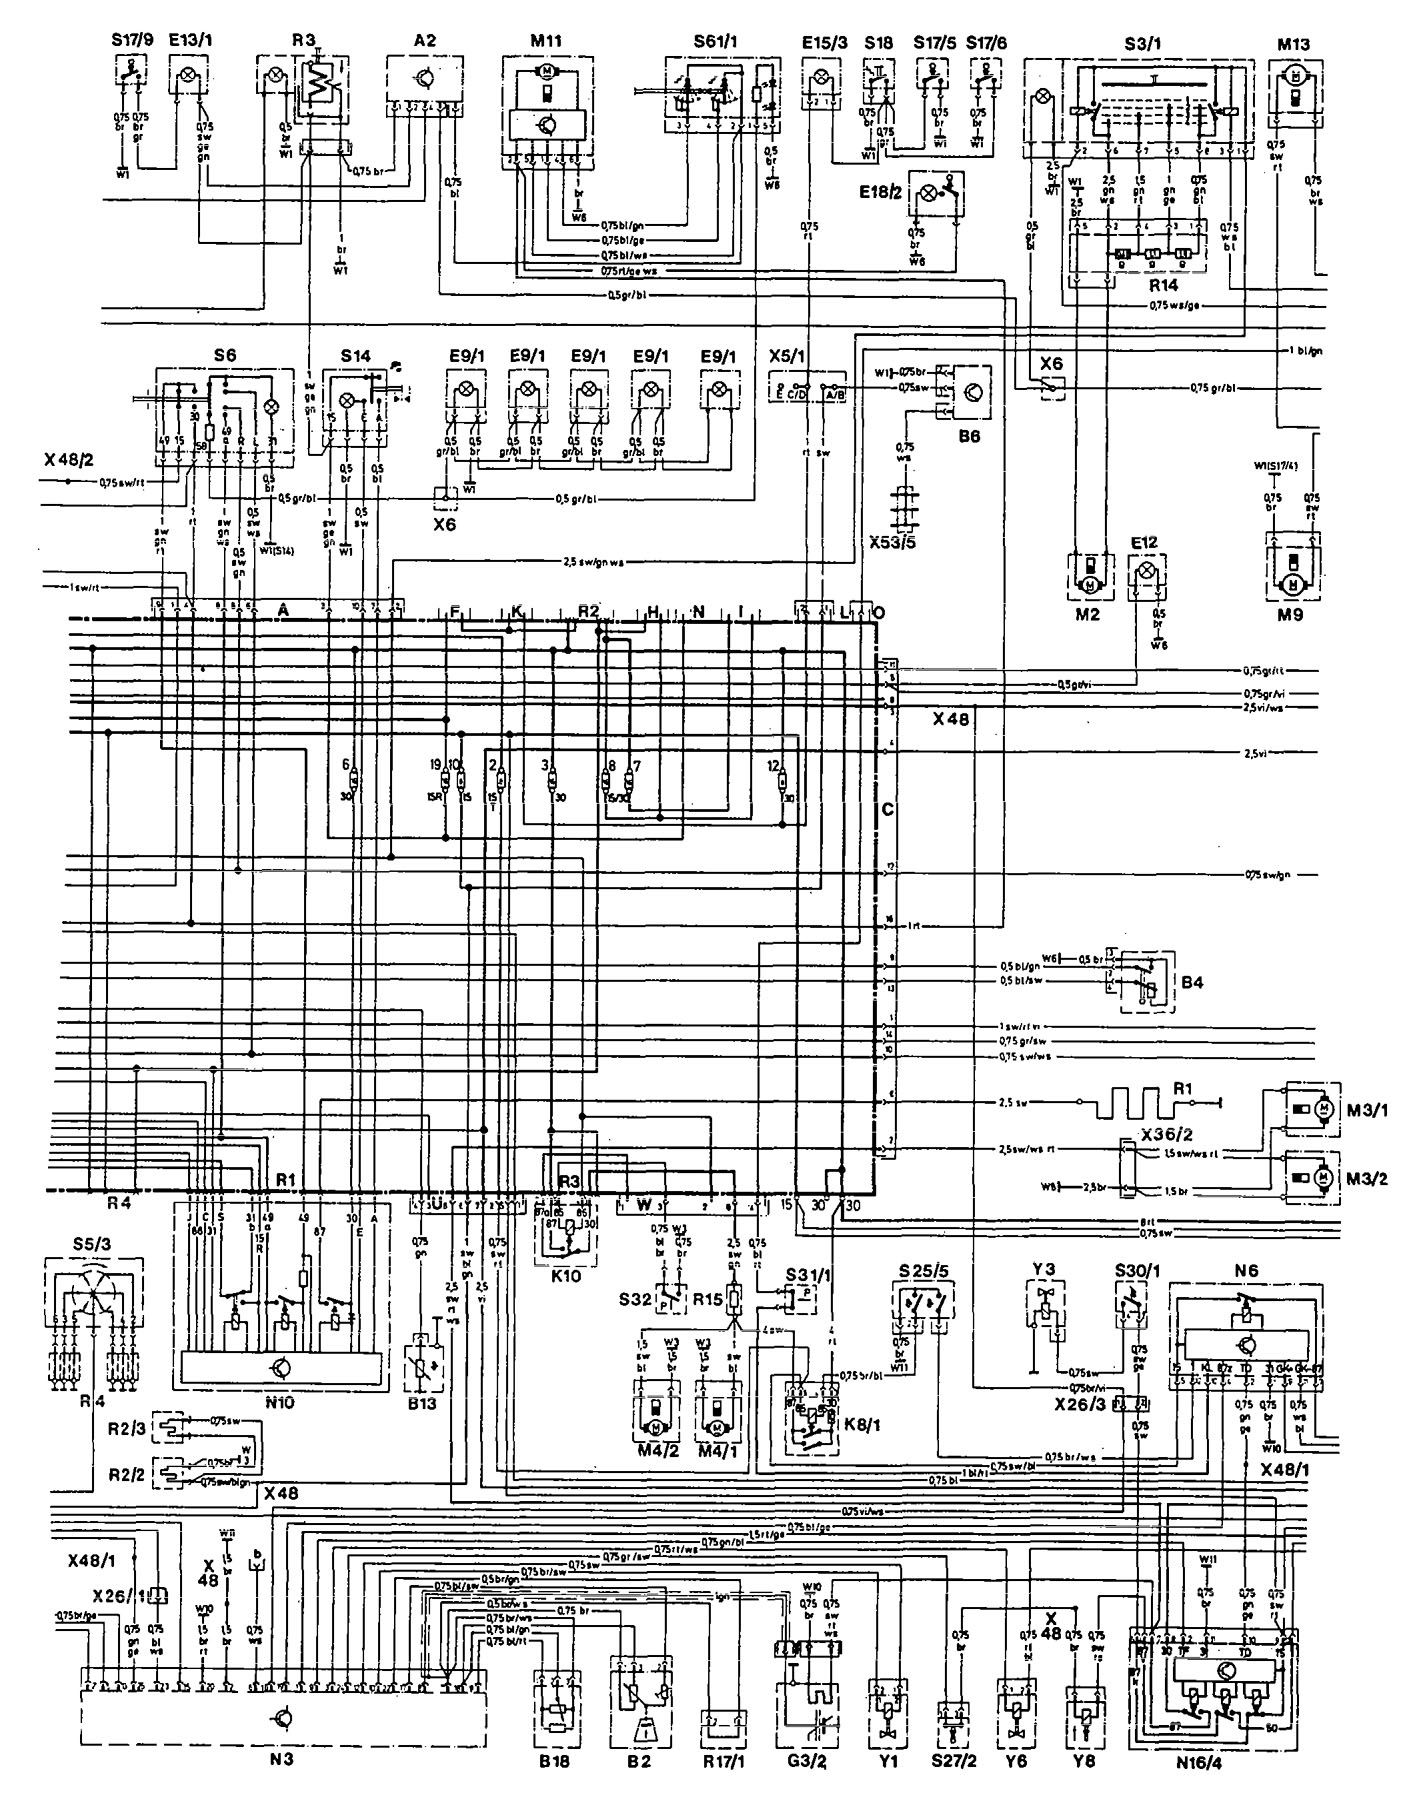 1993 mercedes benz 190e wiring diagram - wiring diagram loan-cable-c -  loan-cable-c.piuconzero.it  piuconzero.it